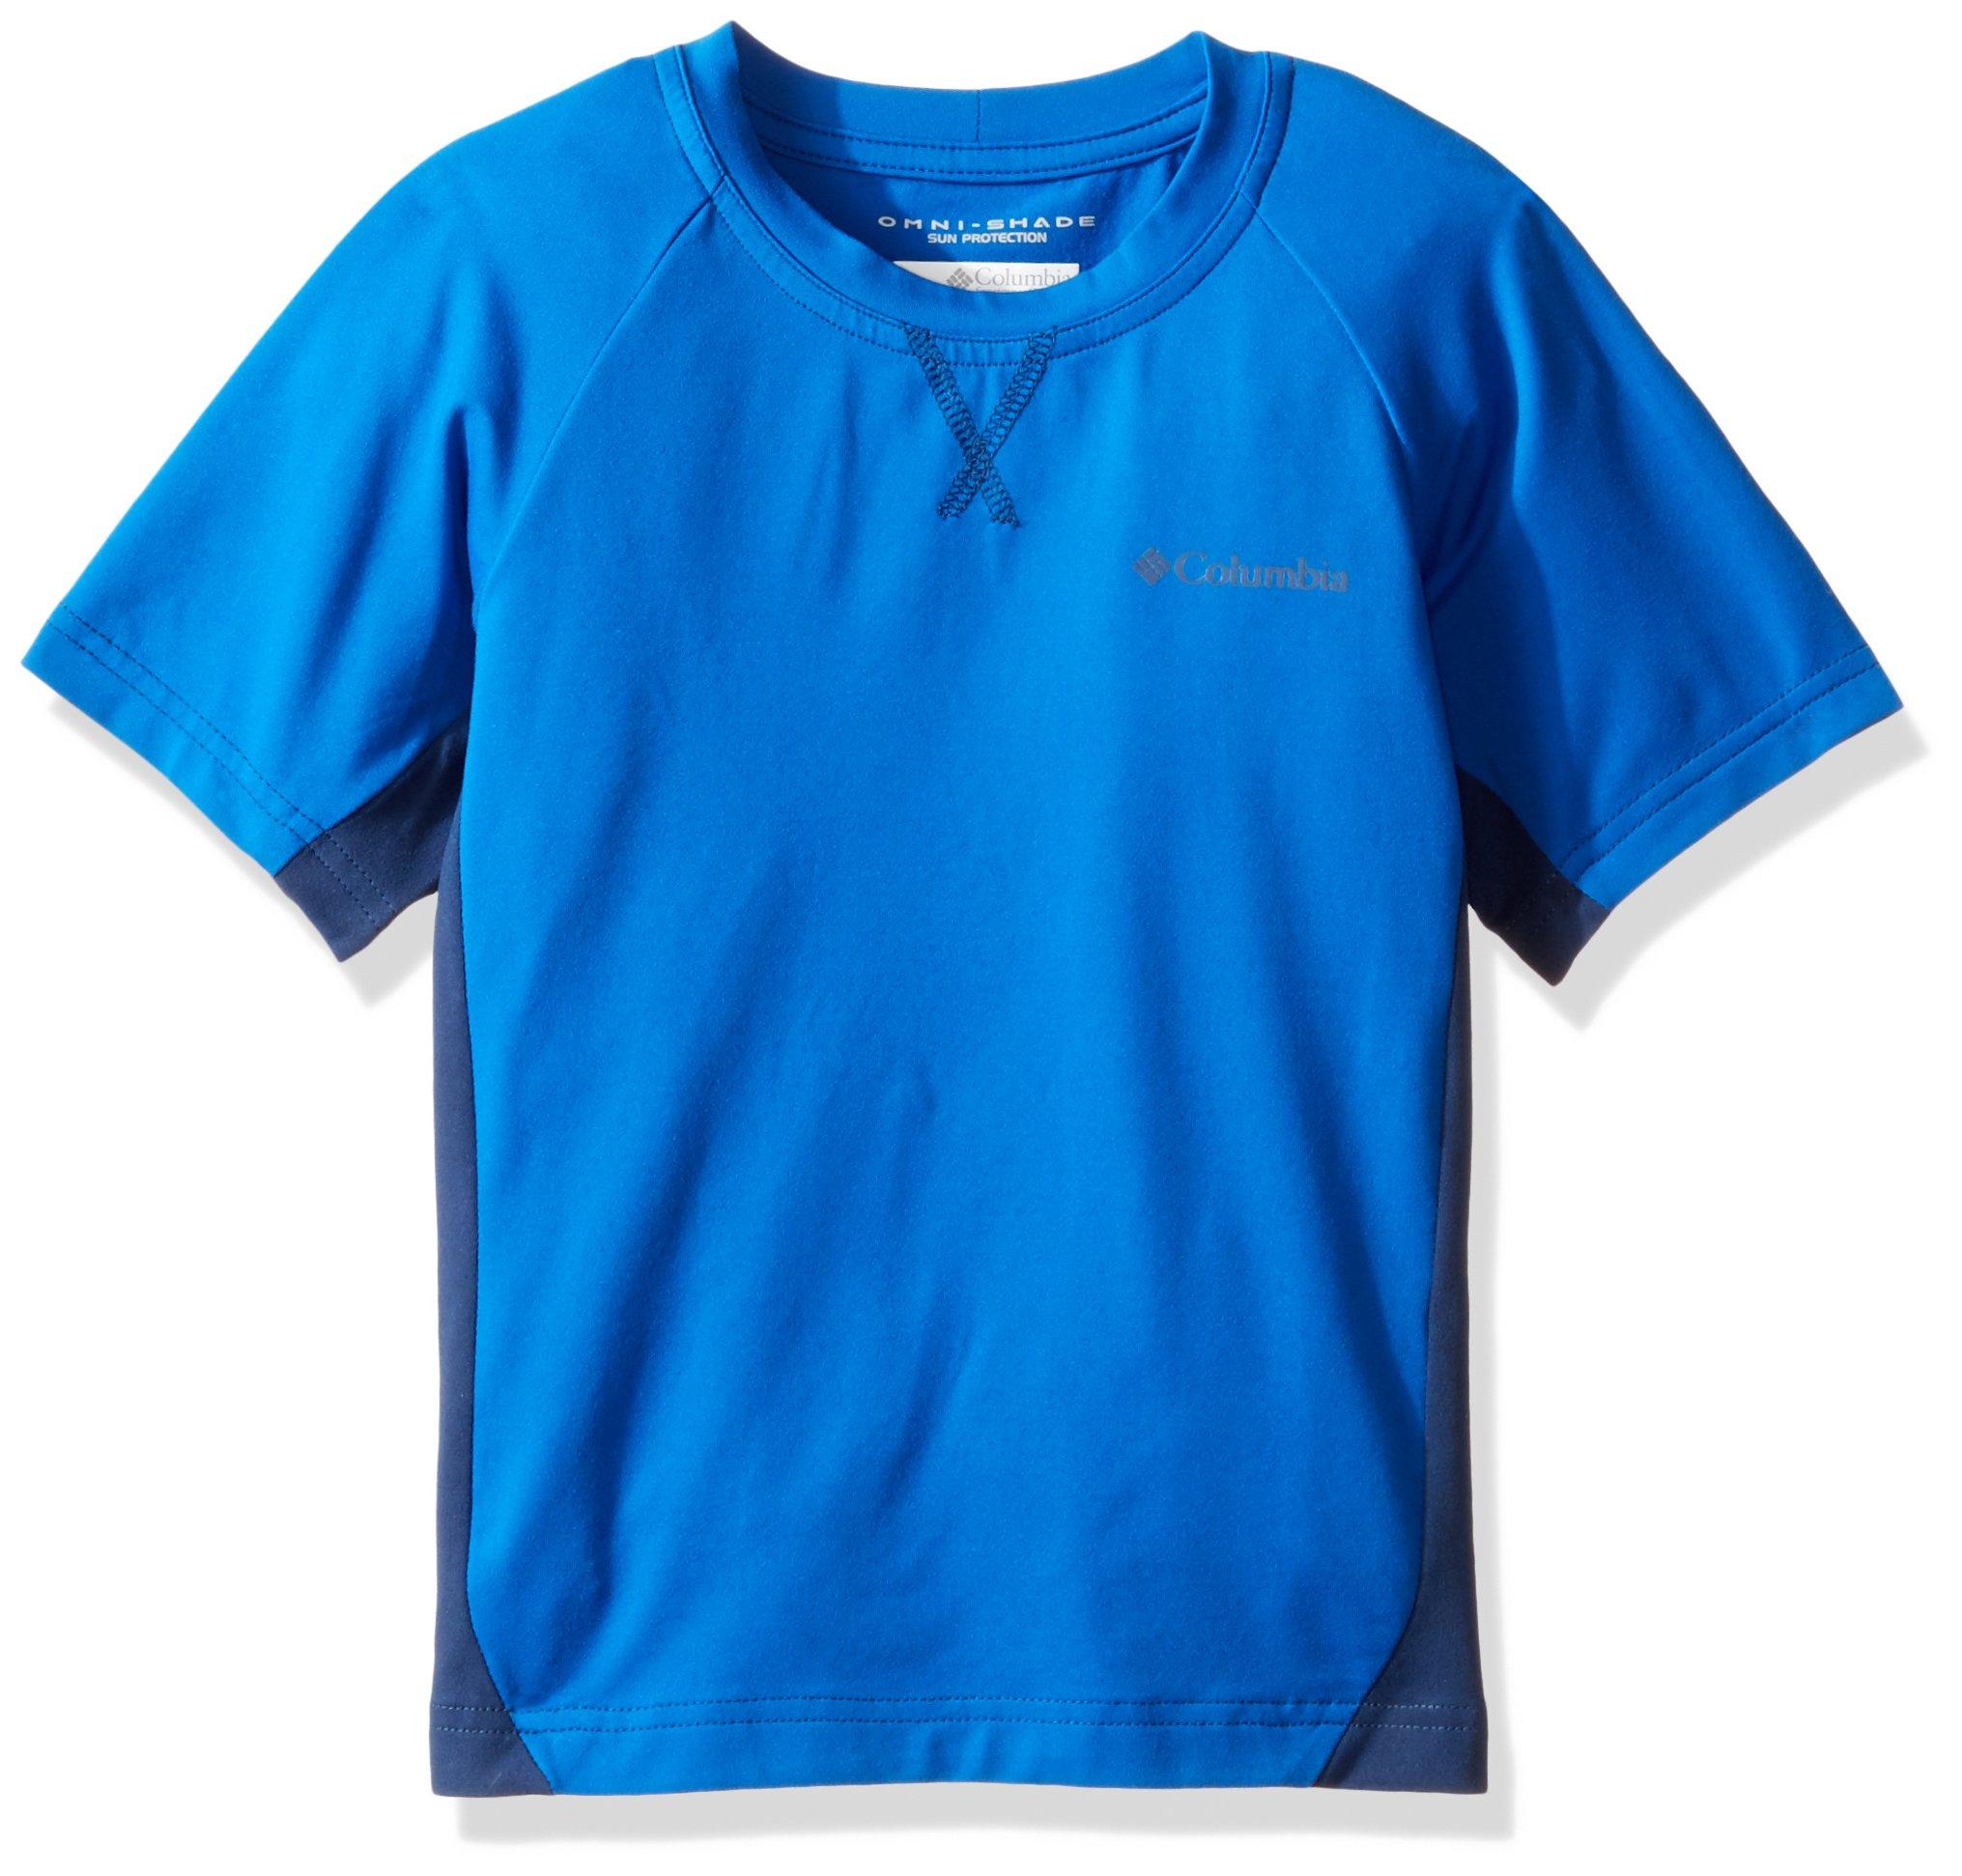 Columbia Boys Silver Ridge Short Sleeve Tee, X-Small, Super Blue, Carbon by Columbia